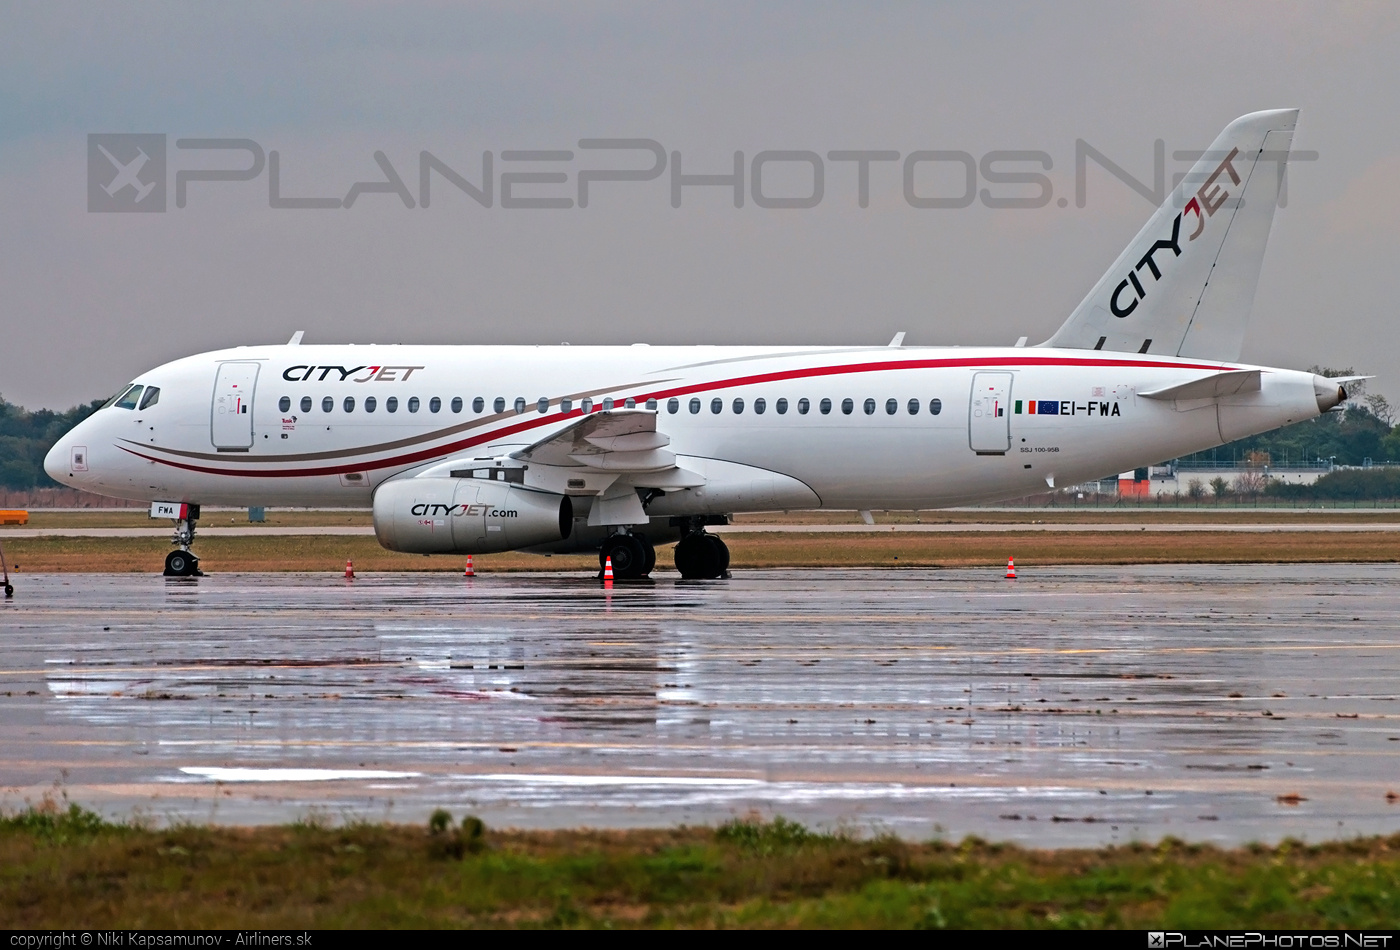 Sukhoi SSJ 100-95B Superjet - EI-FWA operated by CityJet #ssj100 #ssj10095b #sukhoi #sukhoisuperjet #superjet